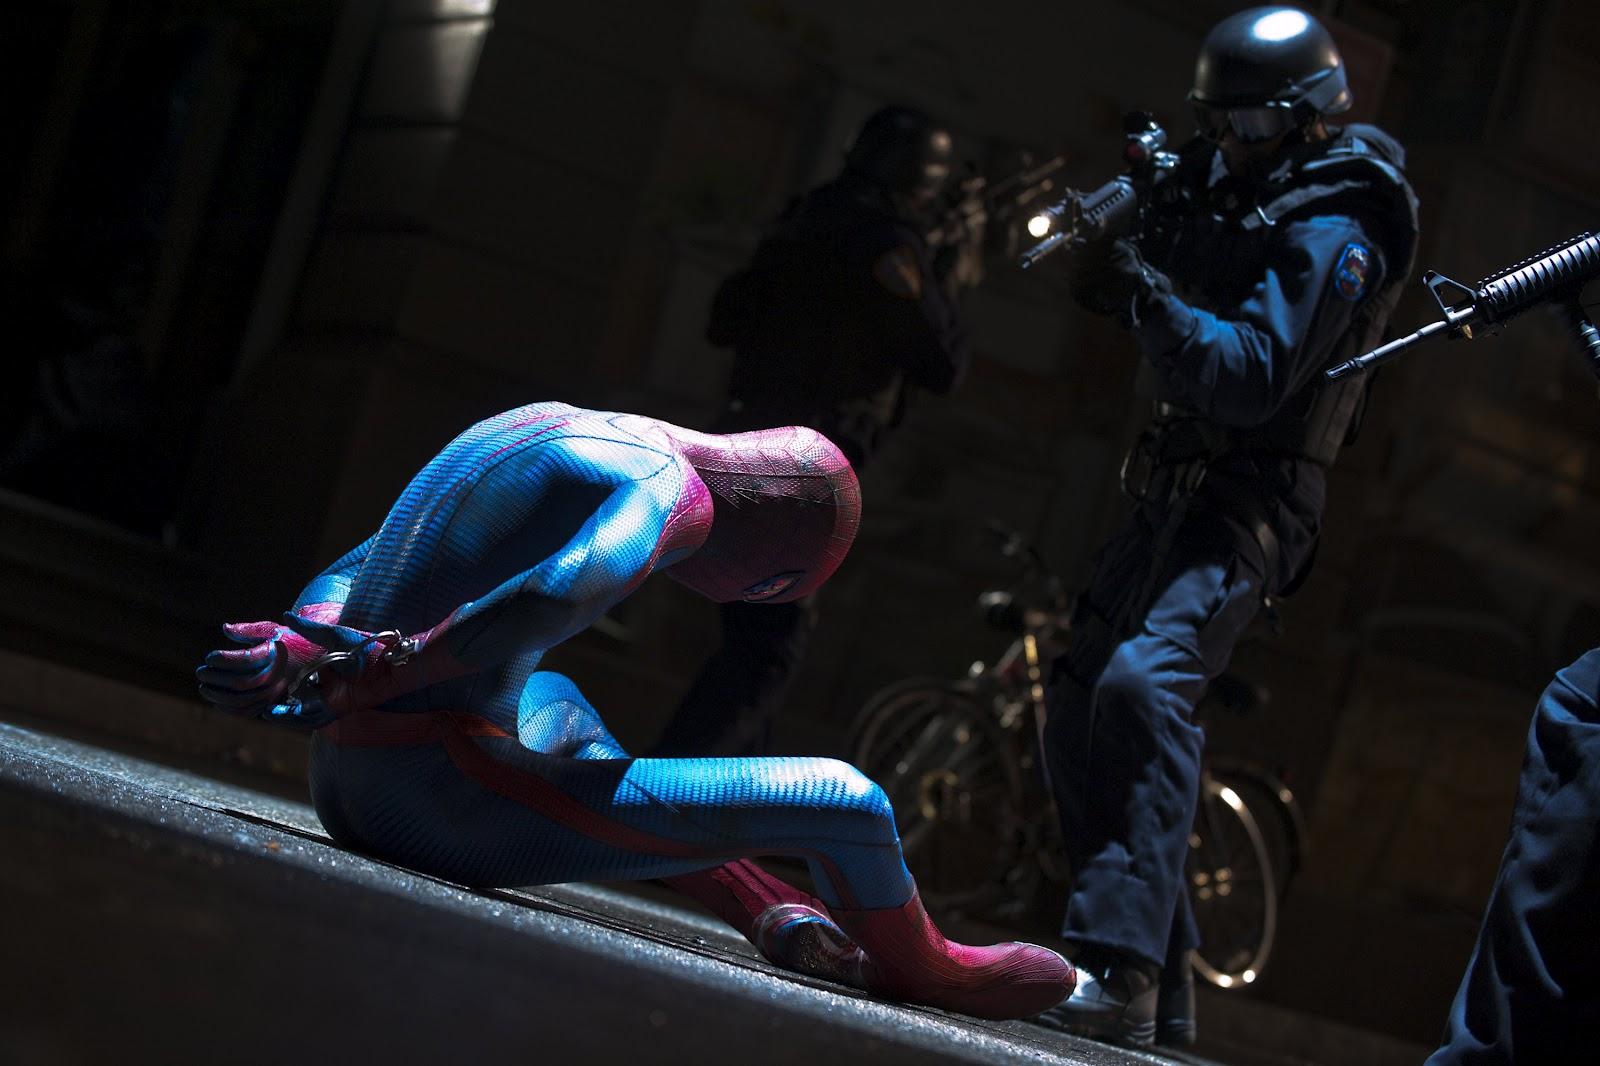 http://2.bp.blogspot.com/-RecsdpWEBJ0/T7Qq9_fCPjI/AAAAAAAAFBM/yDqJv2TdeuE/s1600/the-amazing-spider-man-andrew-garfield-images-2012.jpg